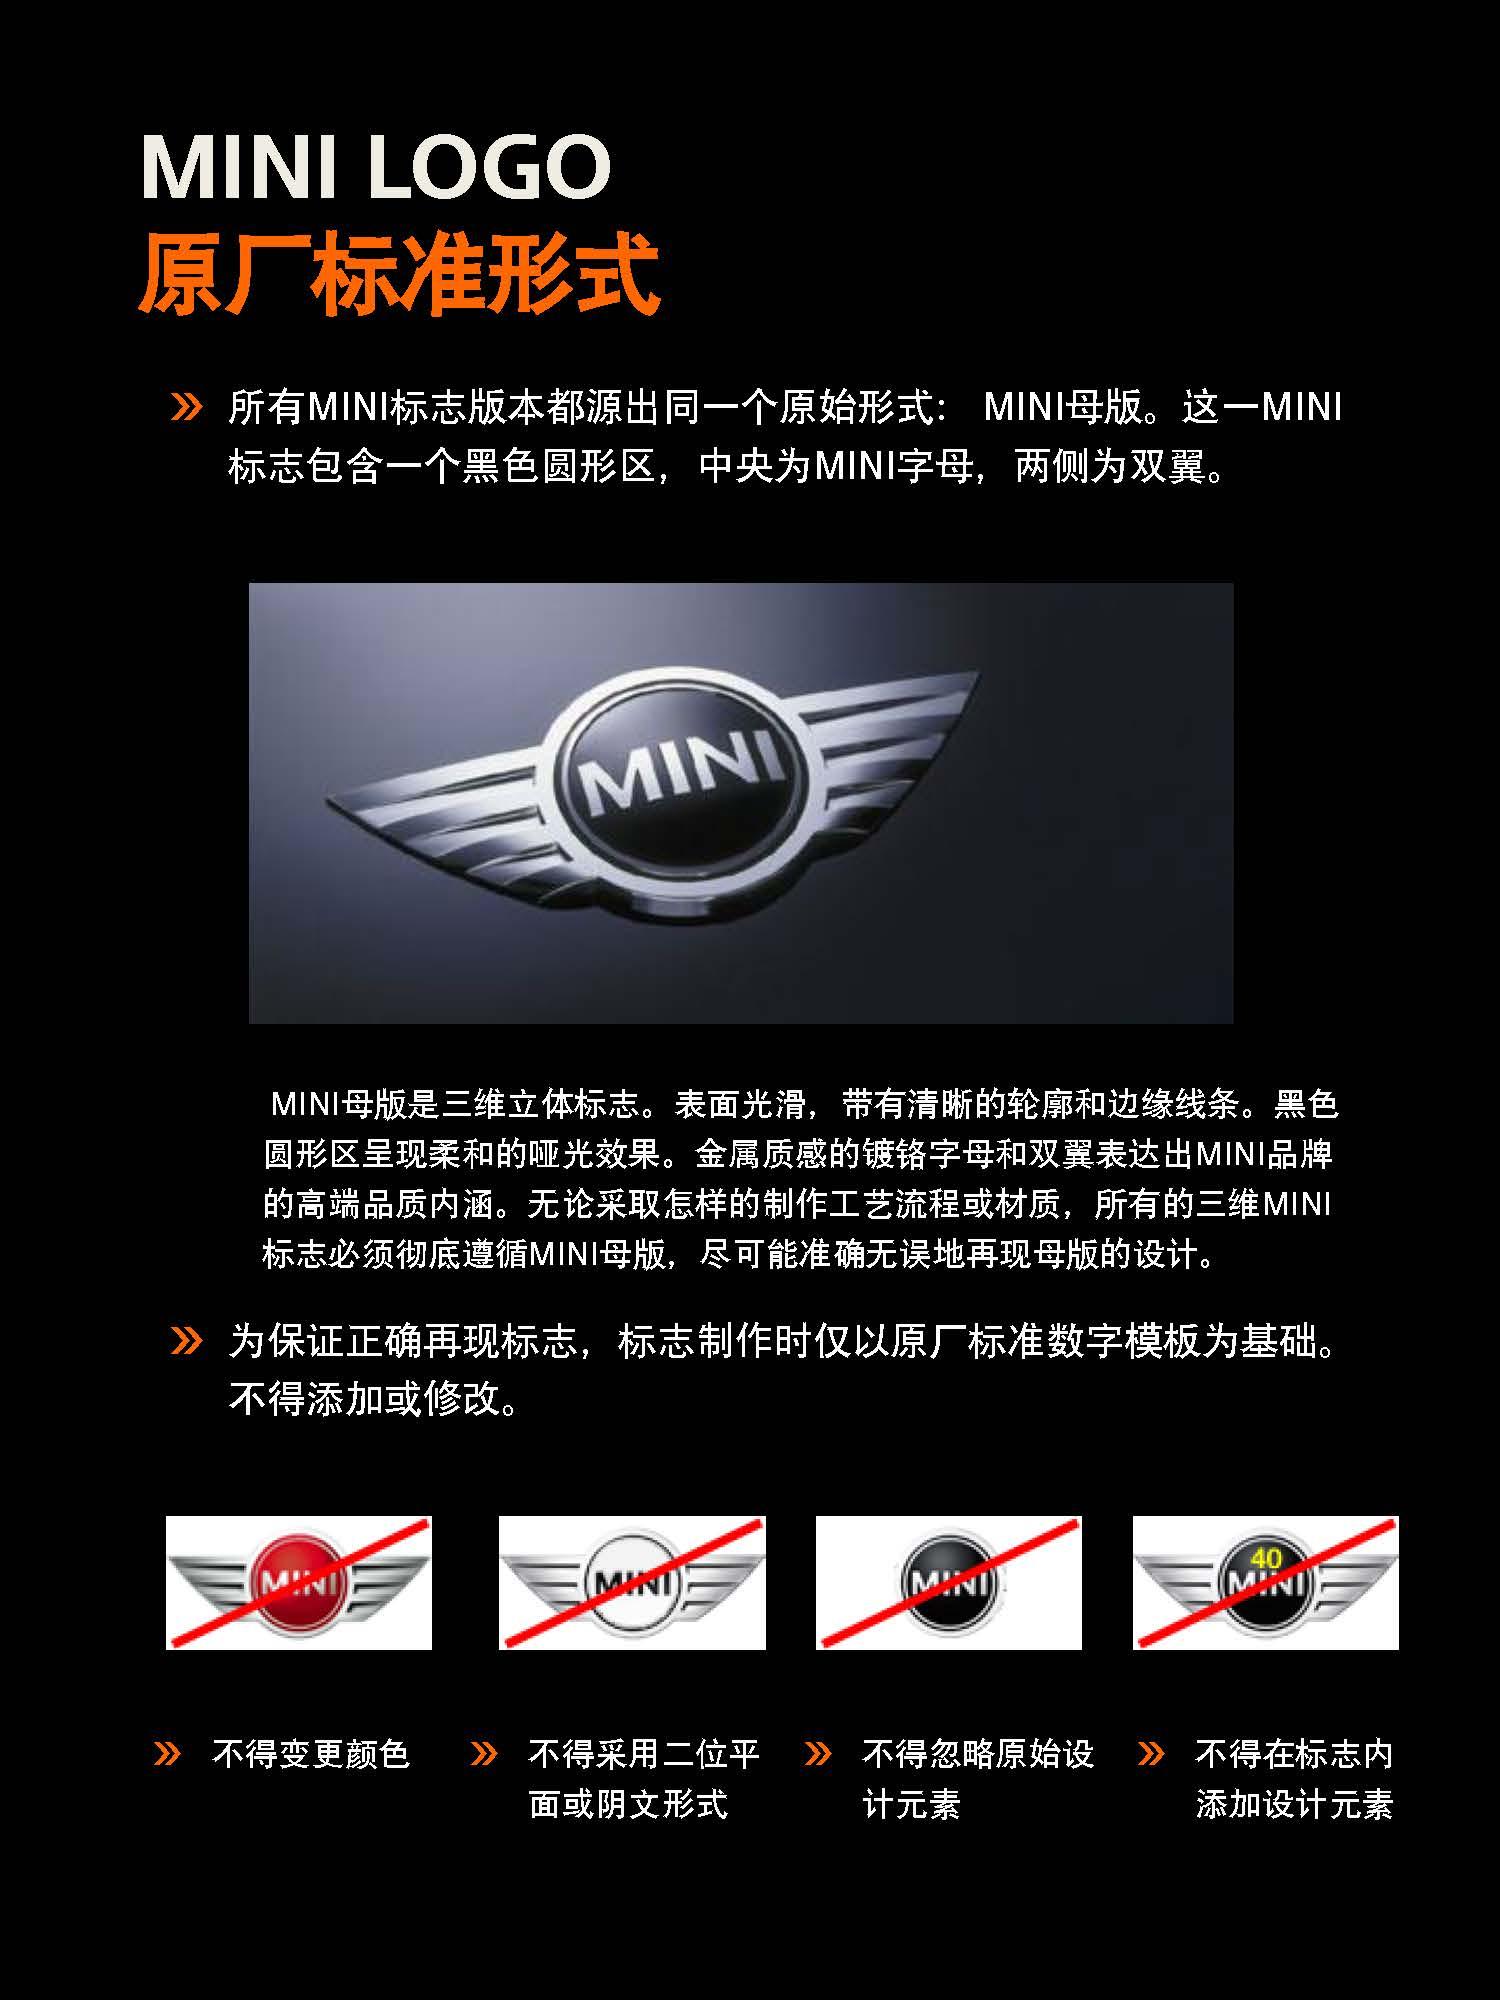 mini迷你汽车品牌指导手册 高清图片